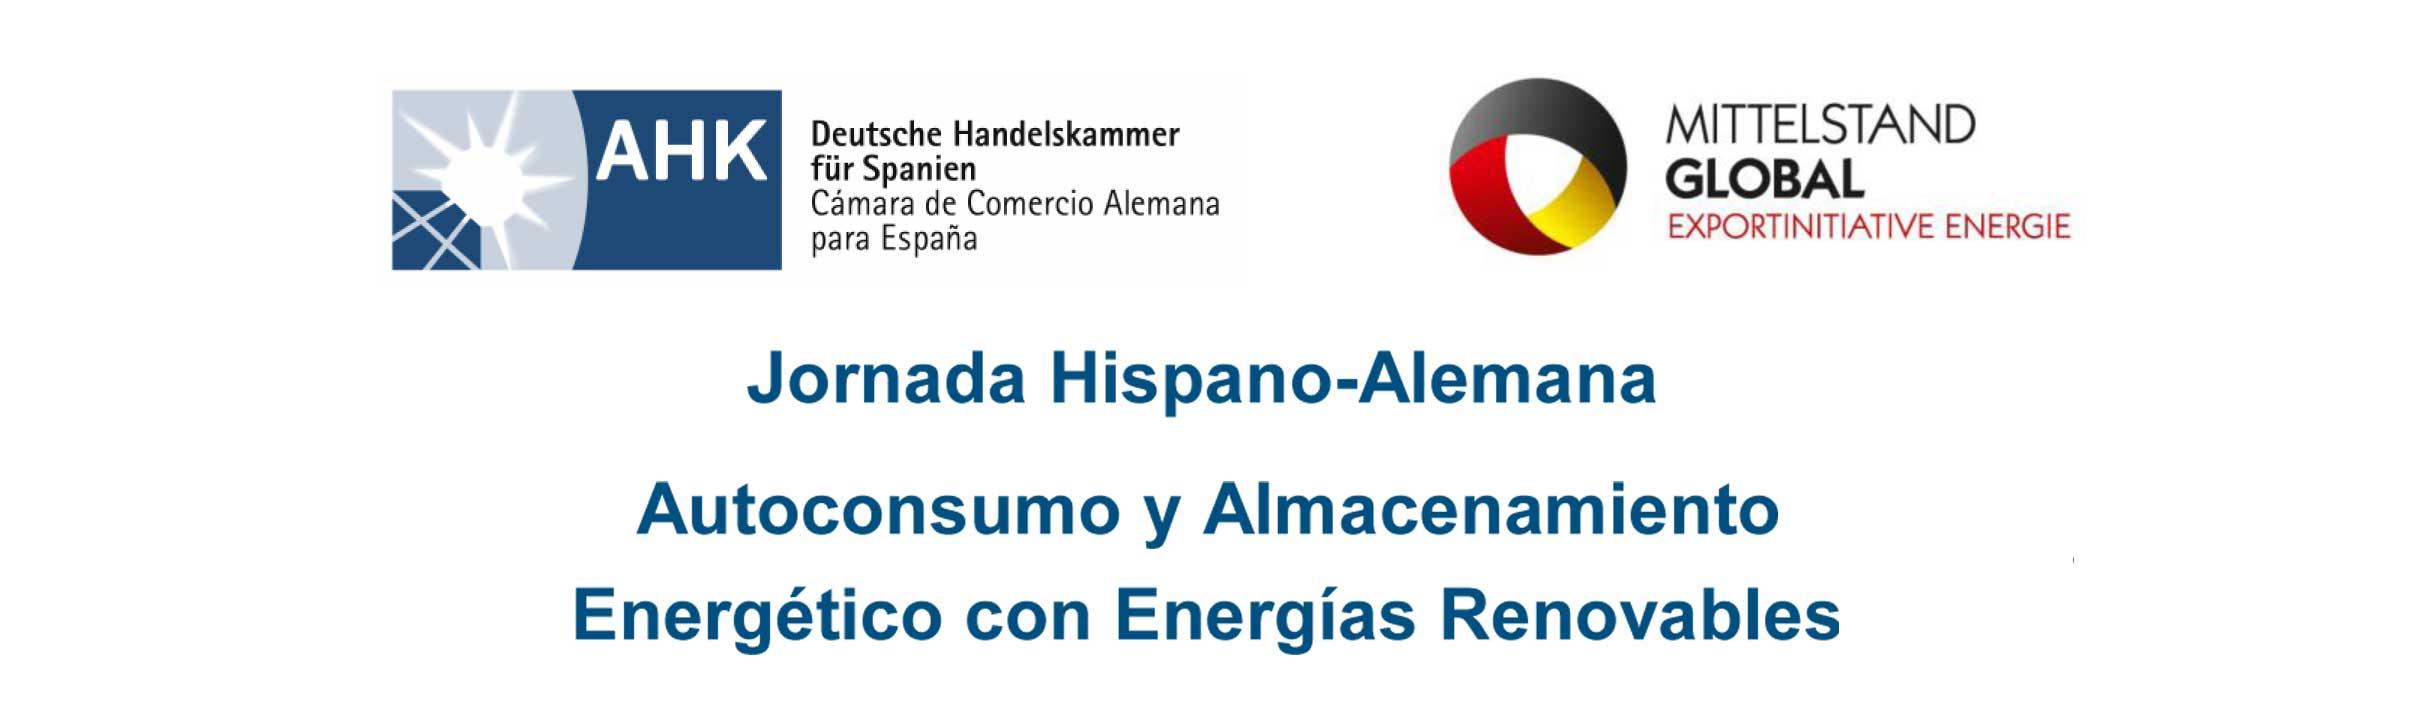 Jornada Hispano-Alemana